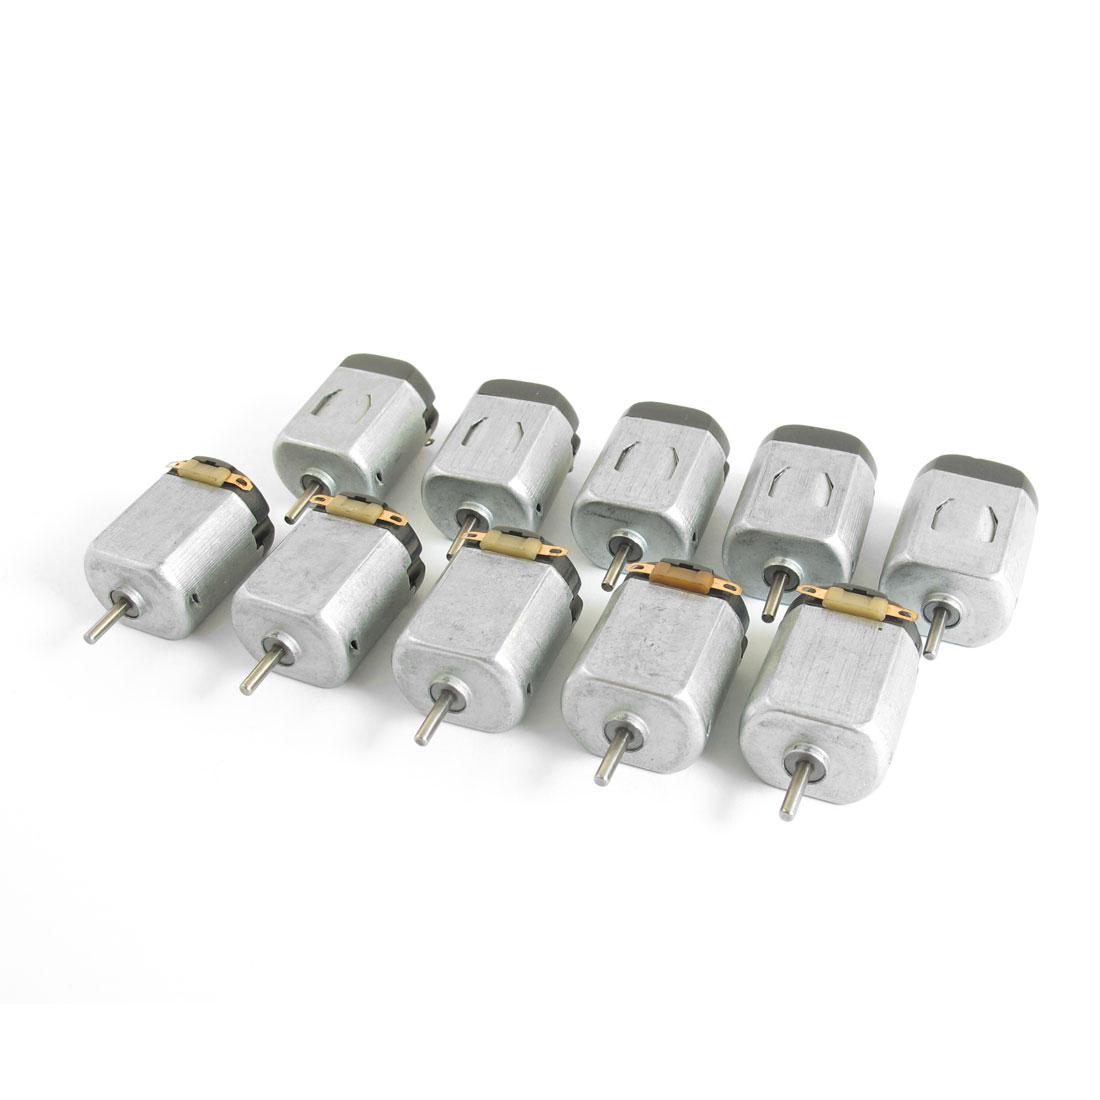 DC 1.5-6V 15000RPM 2mm x 9mm Shaft Micro Motor 10Pcs for DIY Hobby Toys